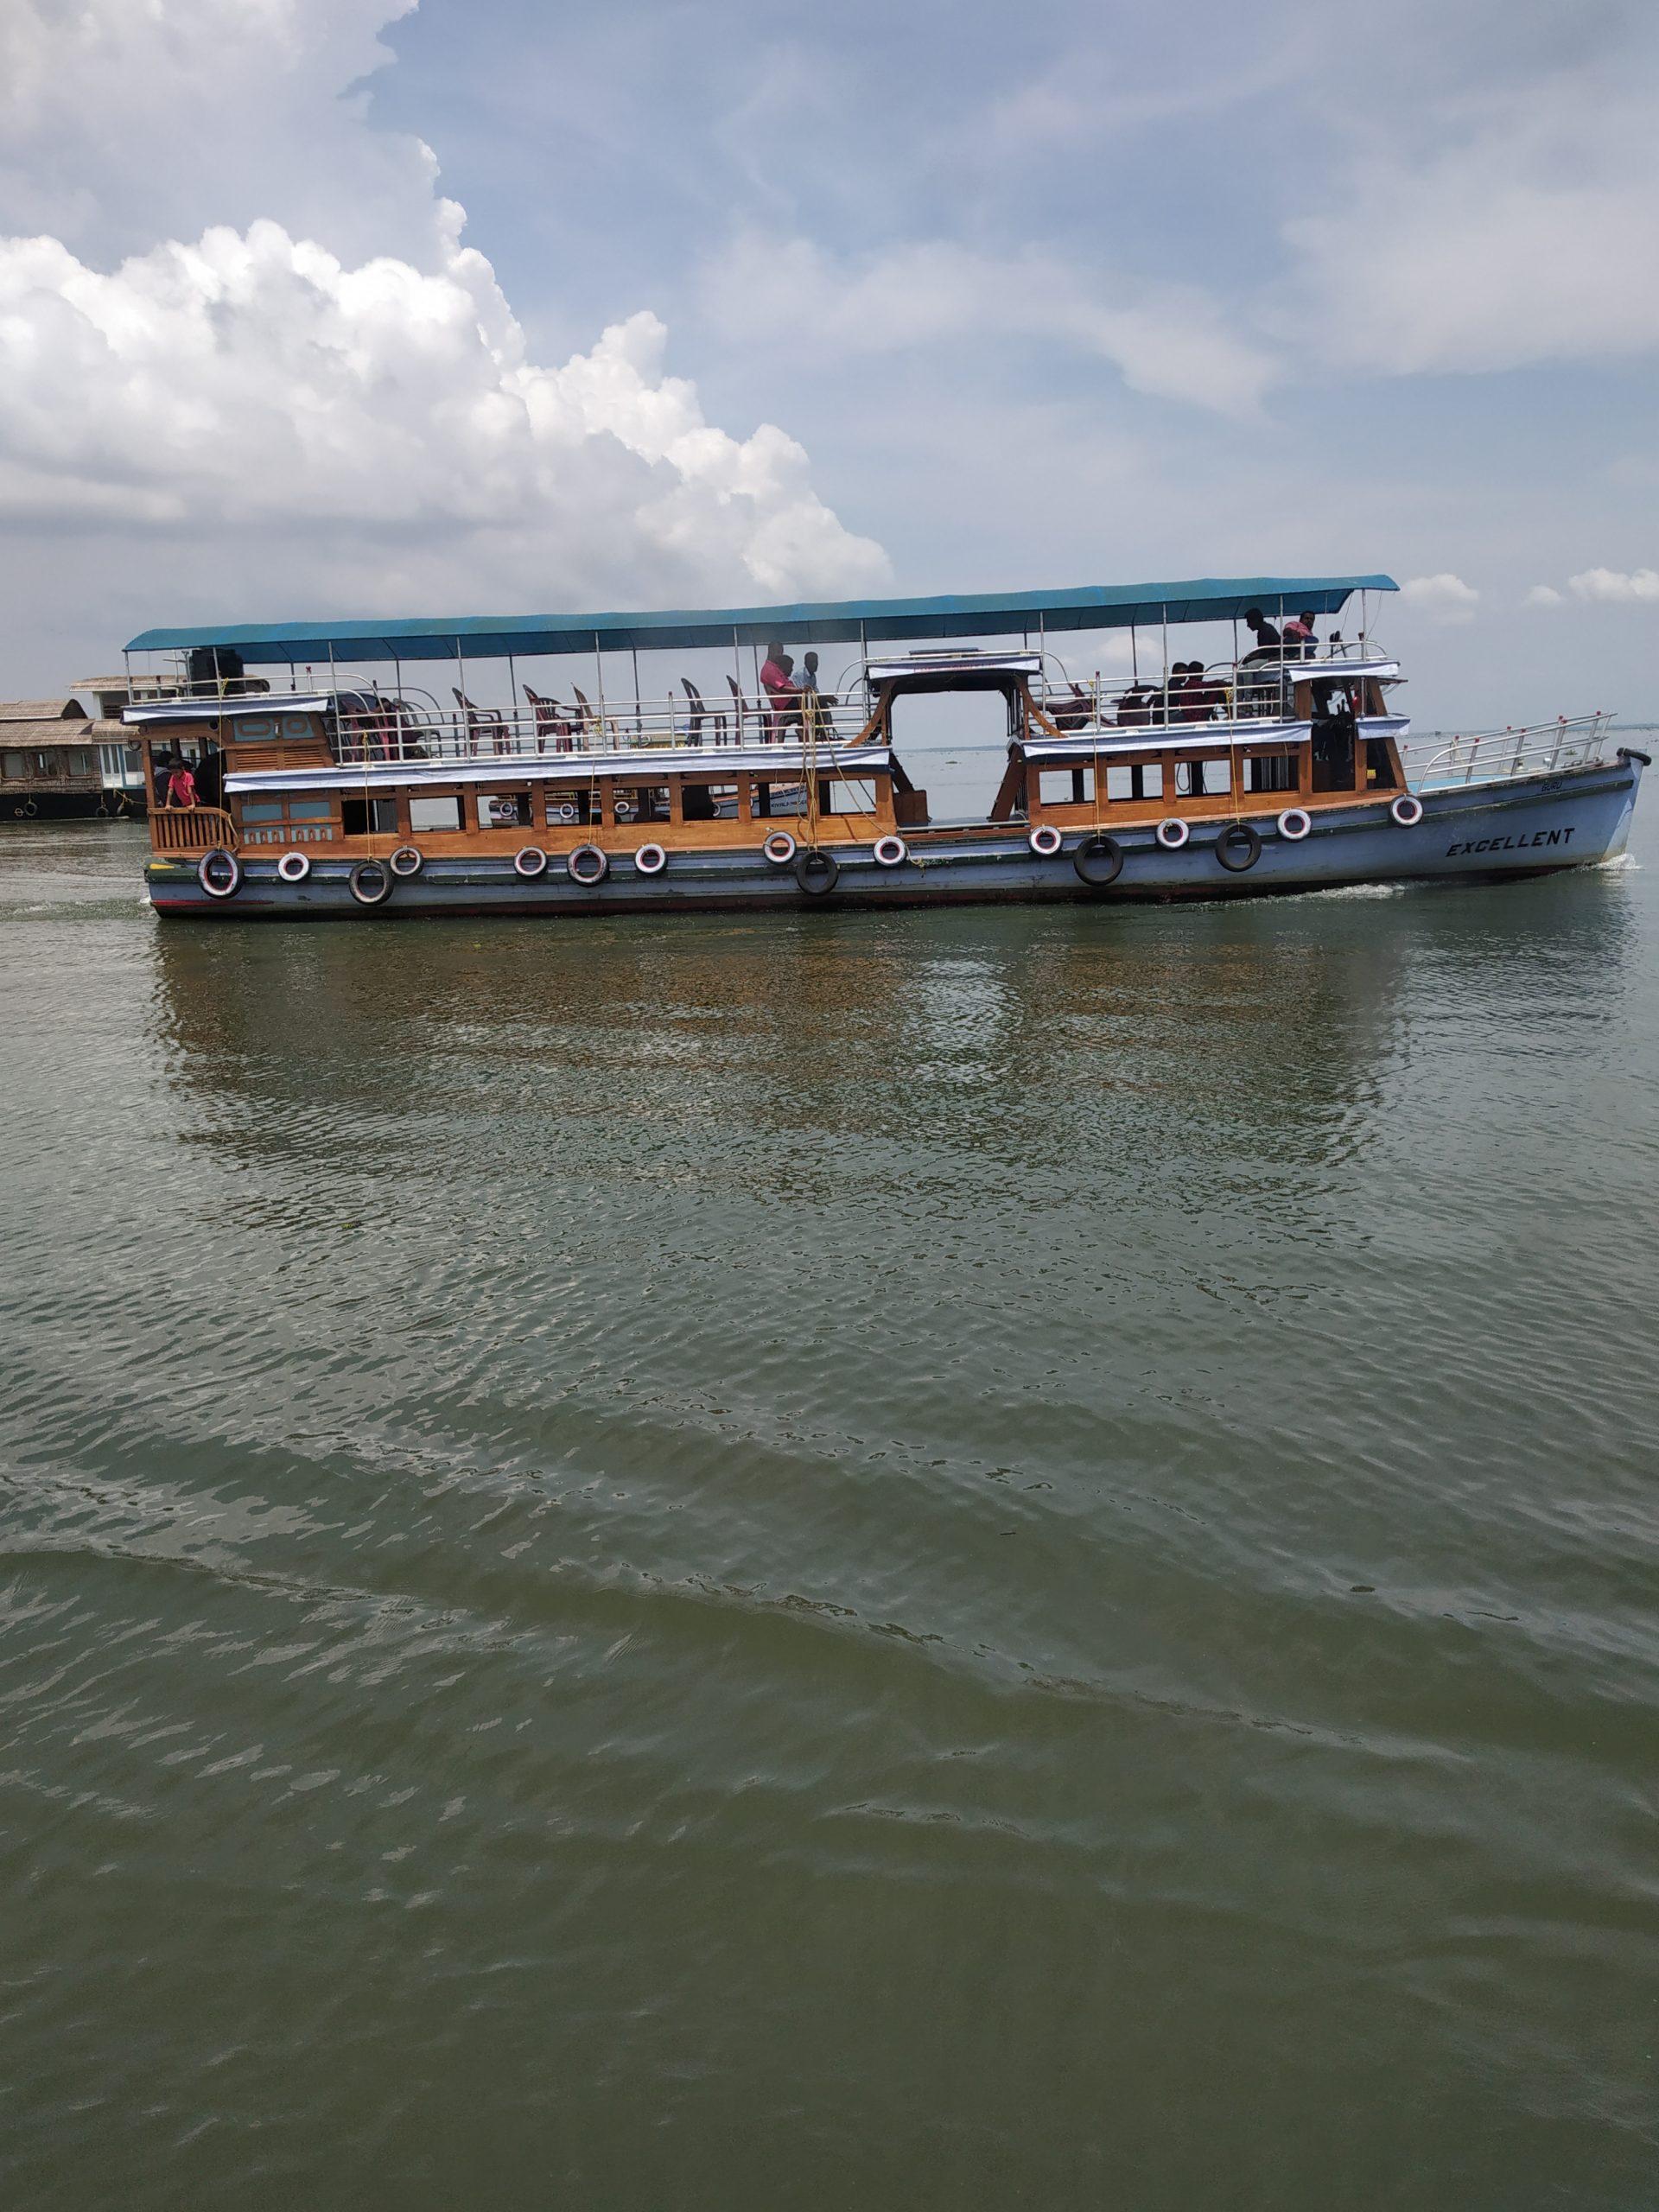 A ferry boat in Azhapuzha